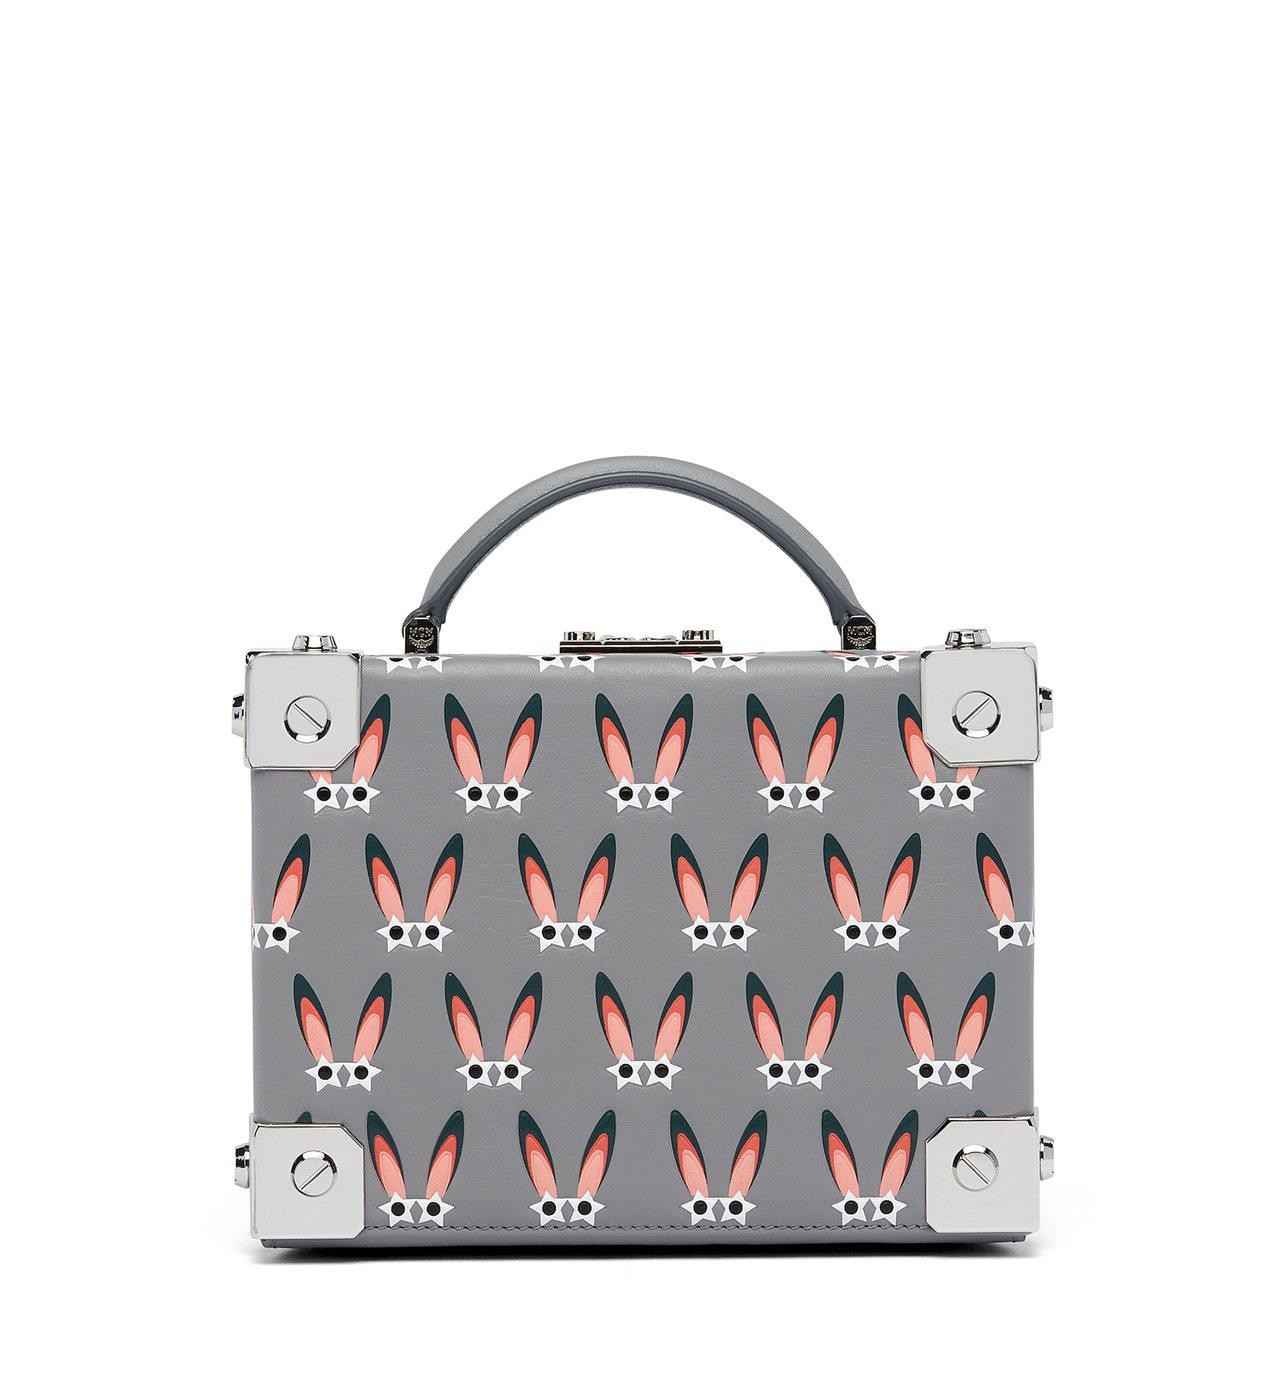 Berlin粉灰色星型眼睛兔側背箱包,售價41,500元。圖/MCM提供